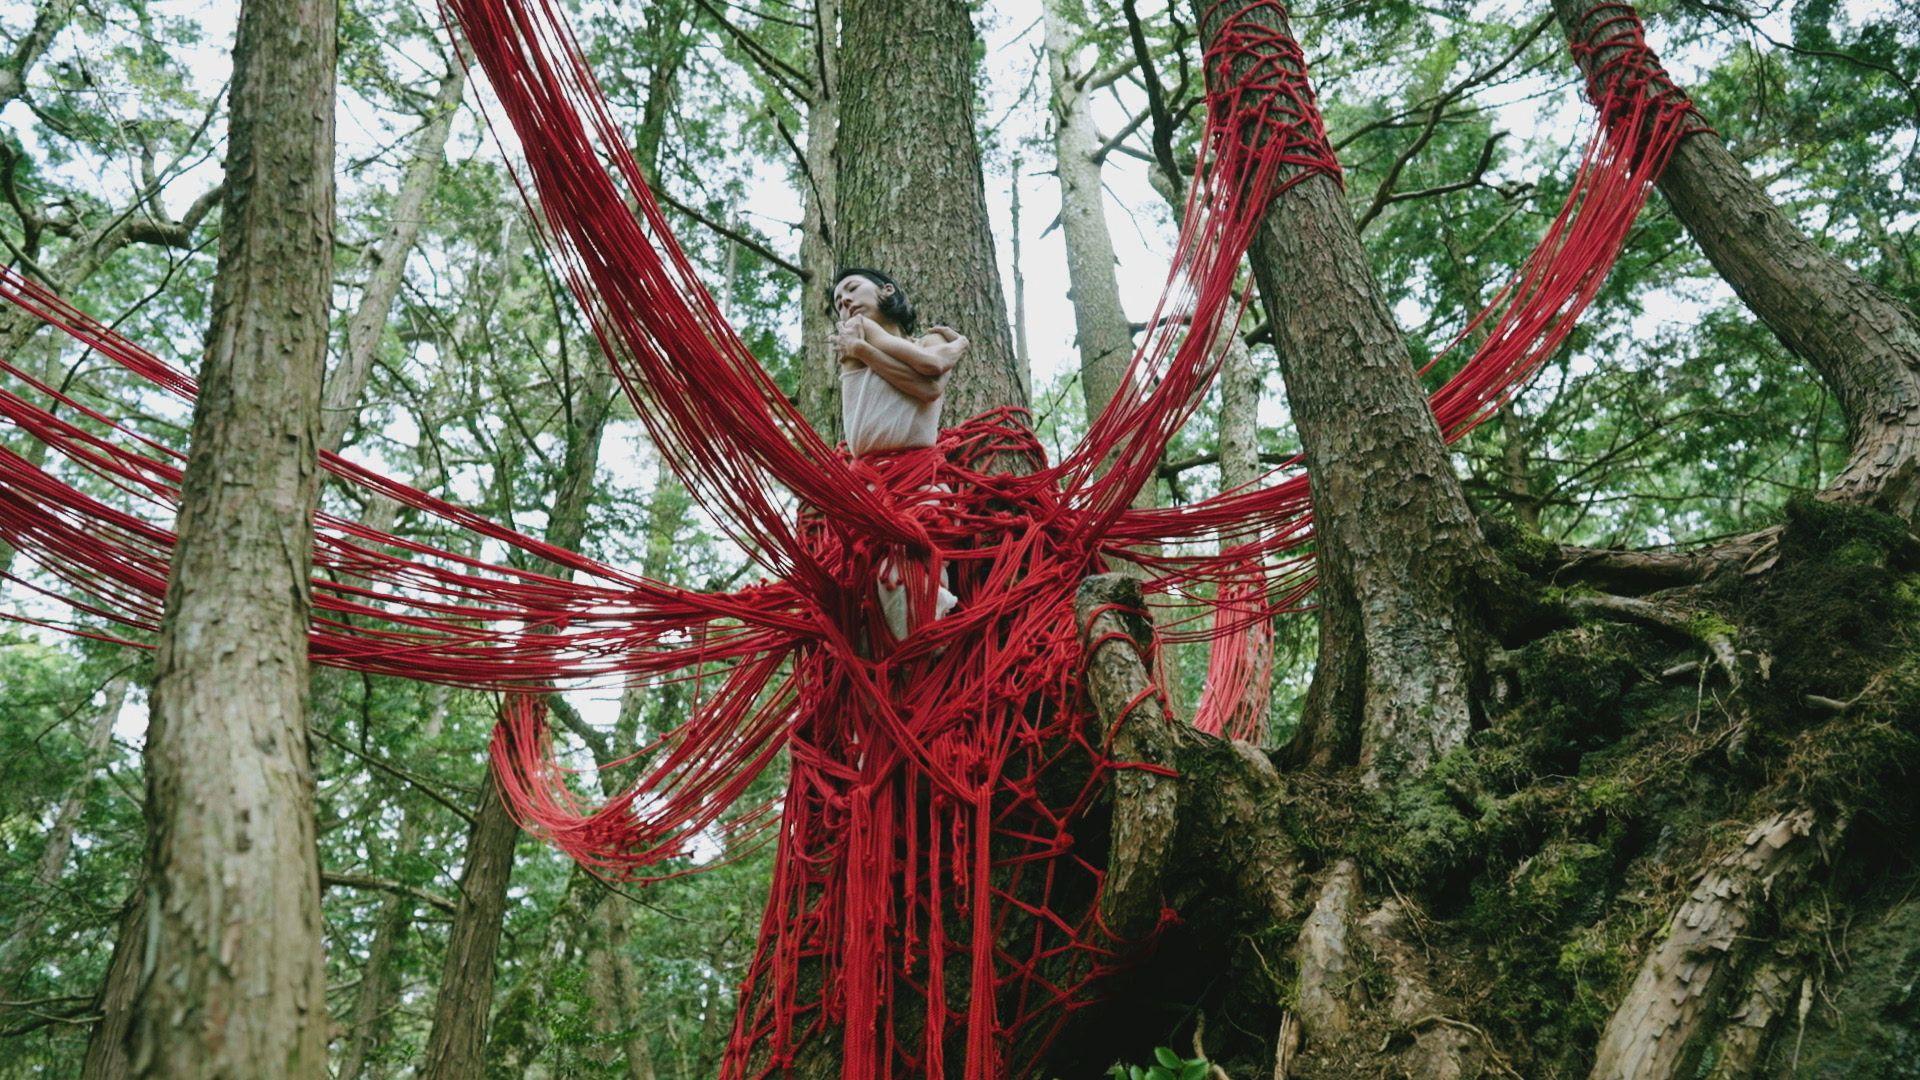 樹海Rope art work 『Reborn』